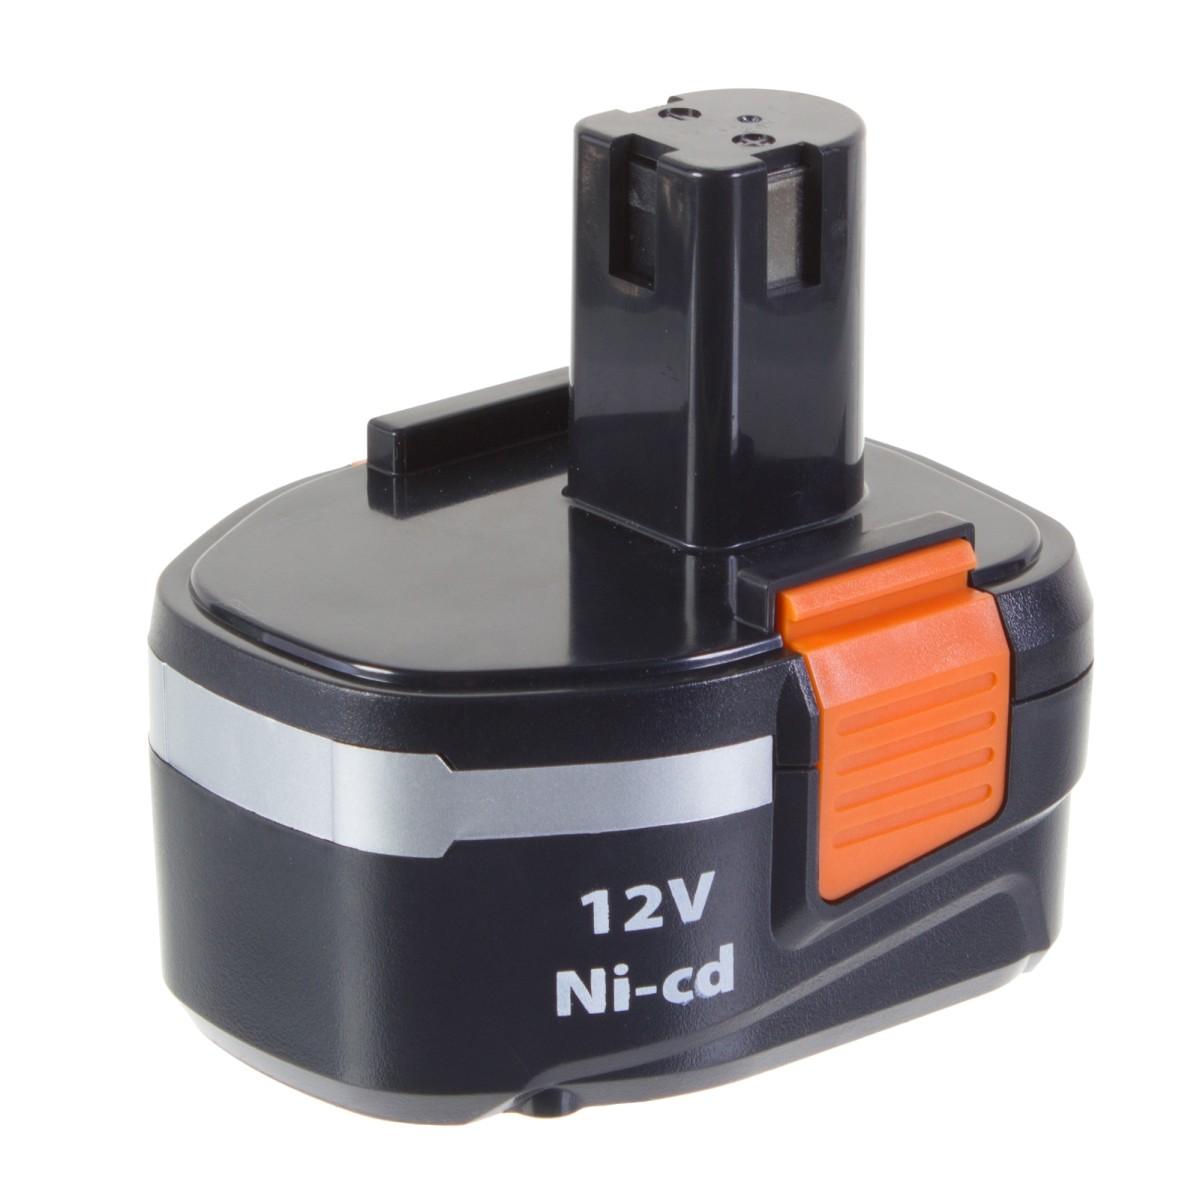 Аккумулятор Dexter 1.3 Ач Ni-Cd 12 В для аккумуляторного инструмента